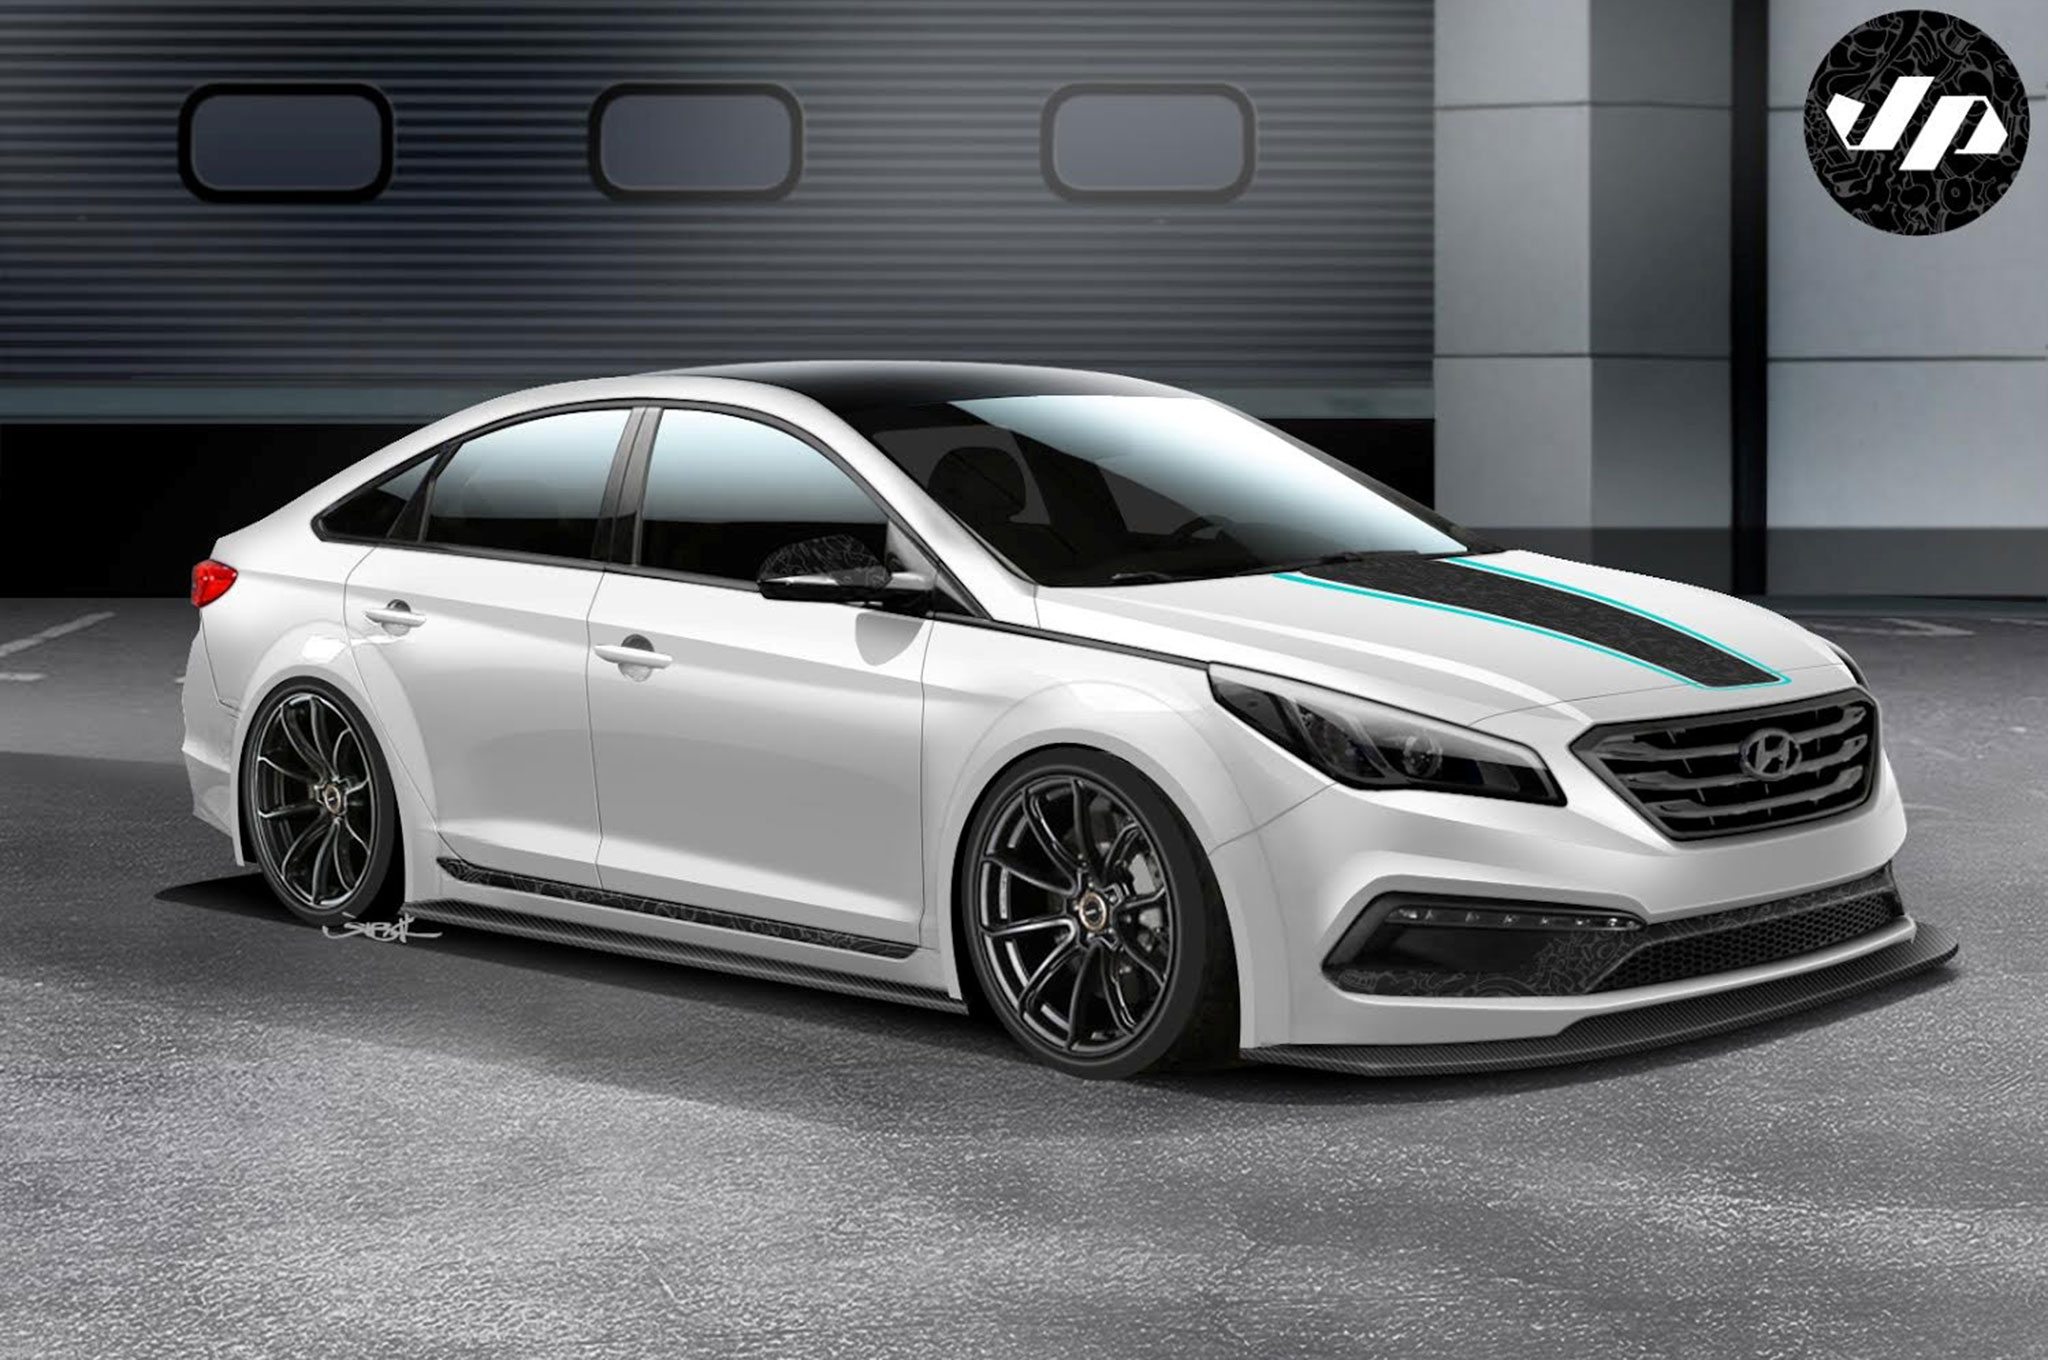 2017 Hyundai Sonata Jp Edition For Sema